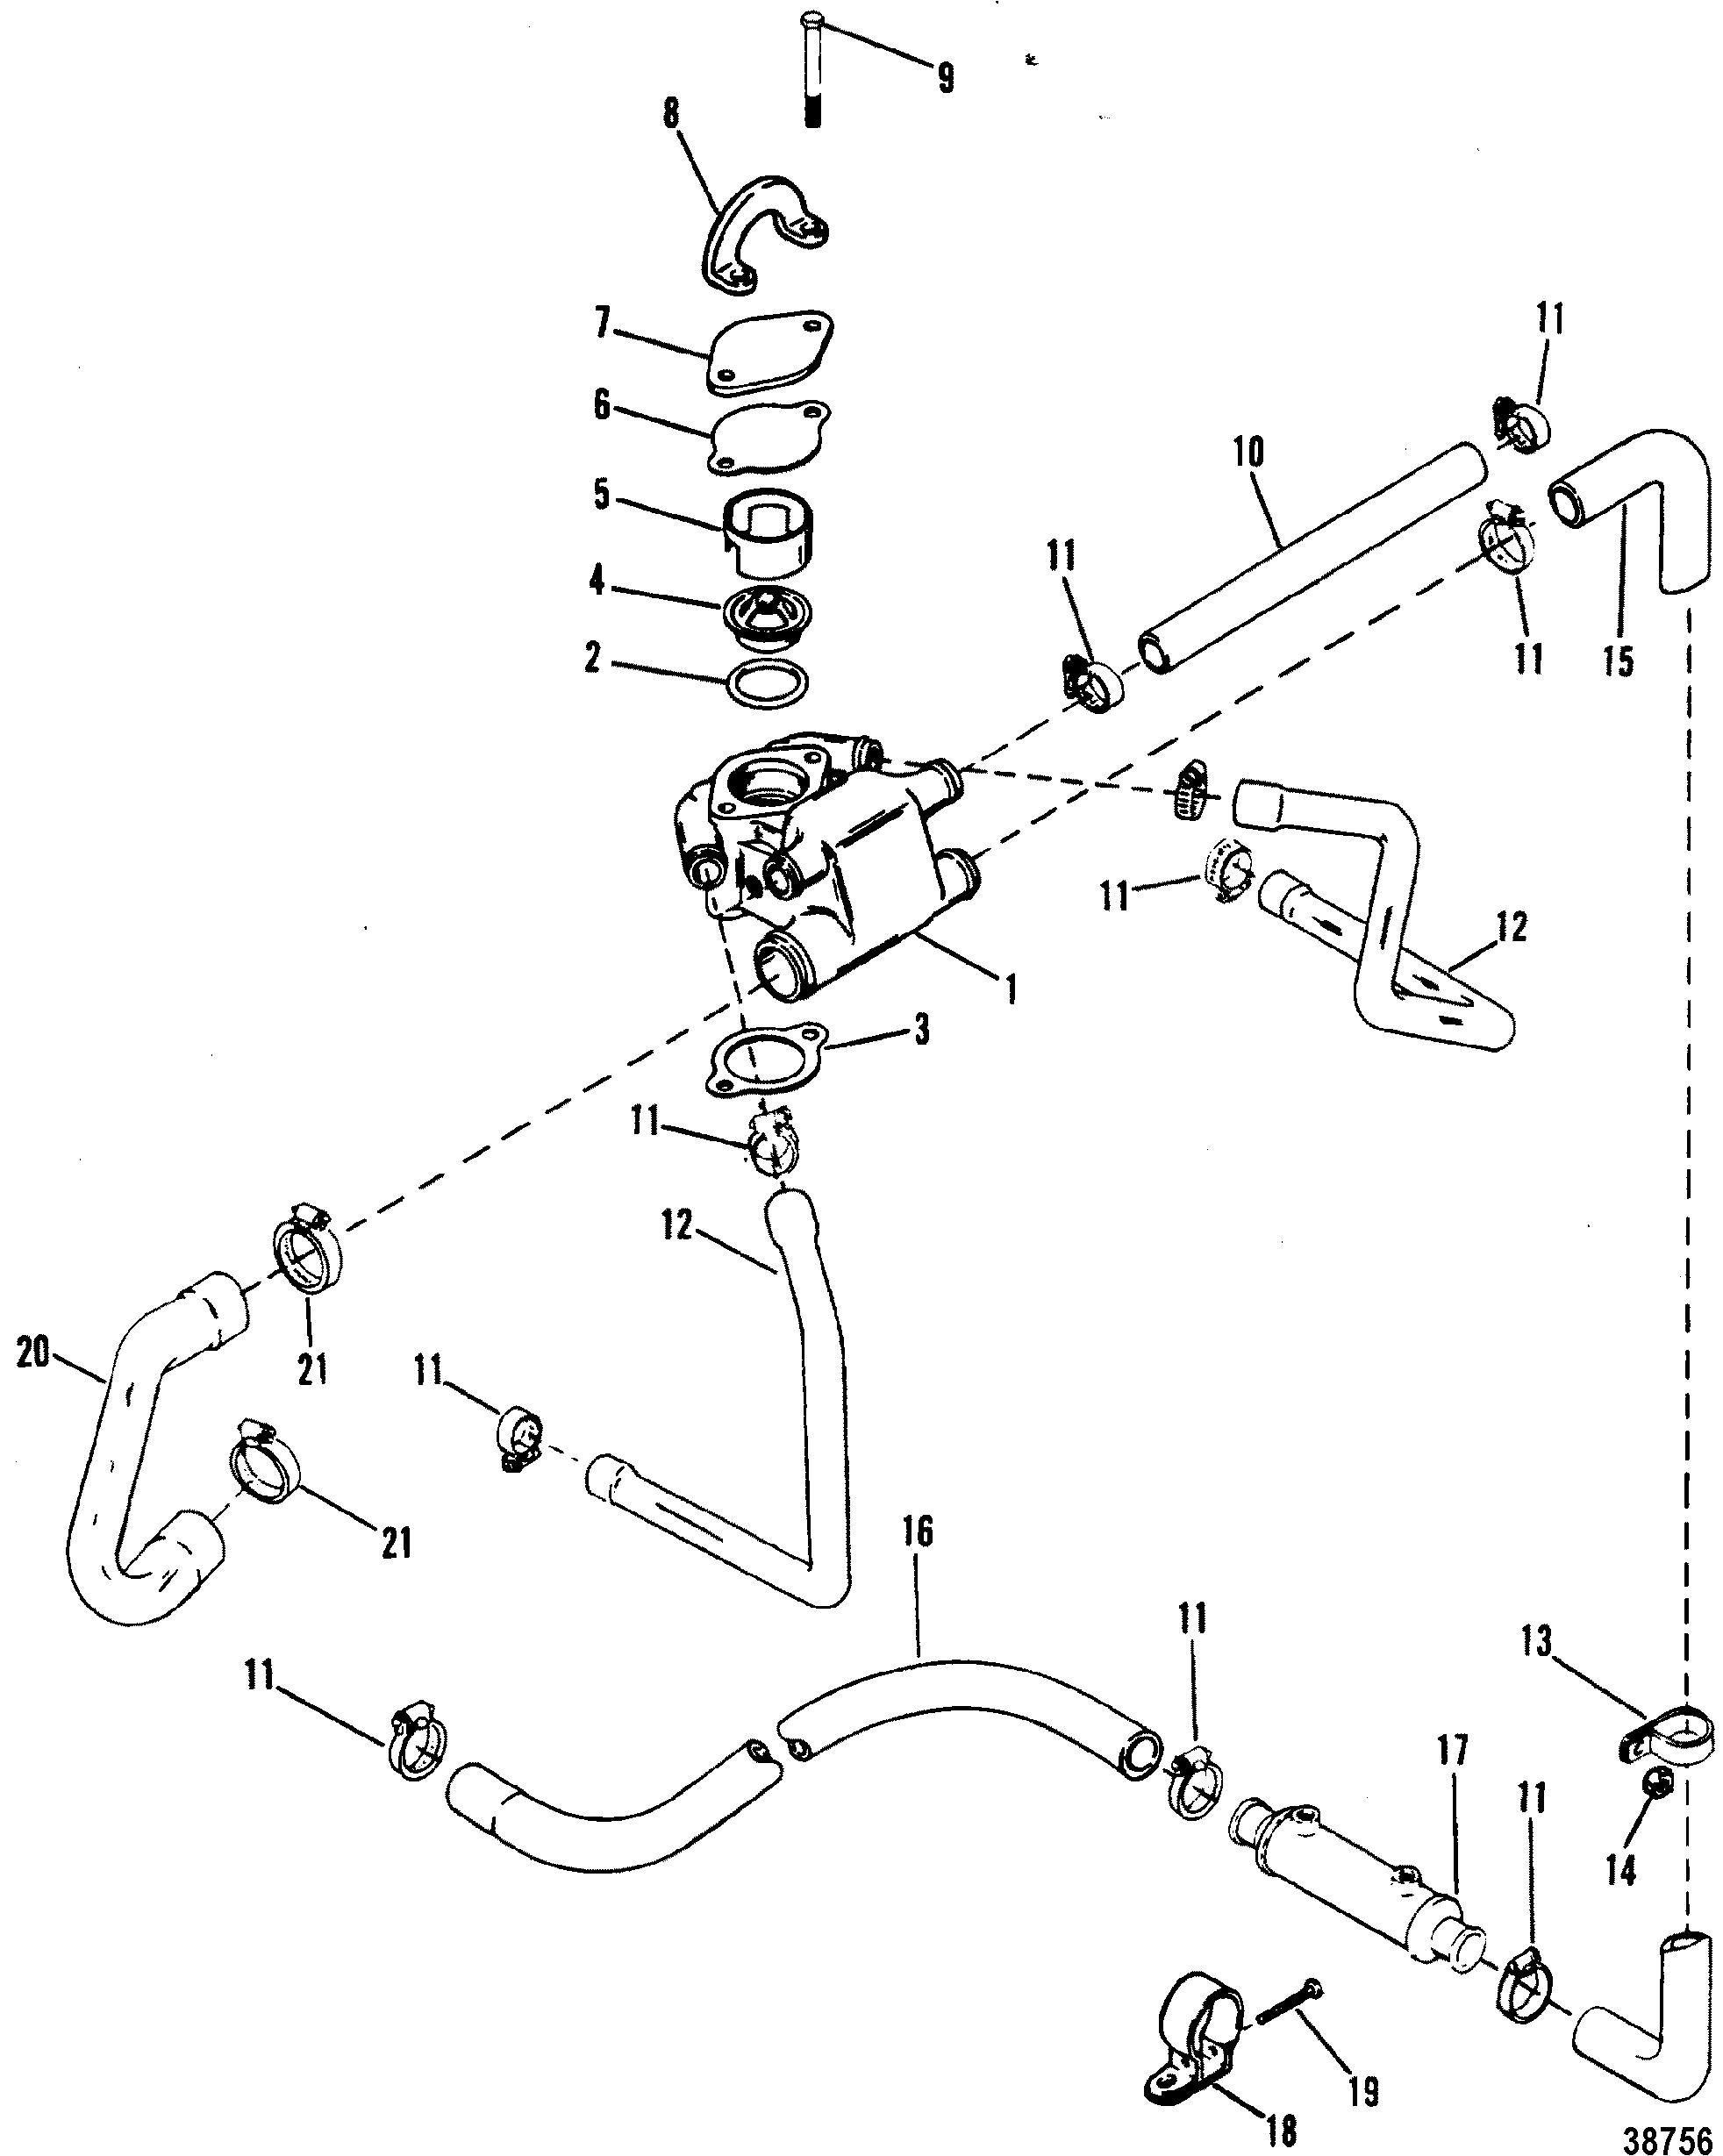 standard cooling system design i for mercruiser 4 3l 4 3lx alpha one mercruiser 4.3 lx wiring diagram standard cooling system(design i) for mercruiser 4 3l 4 3lx alpha one engine (262 cid) gen ii